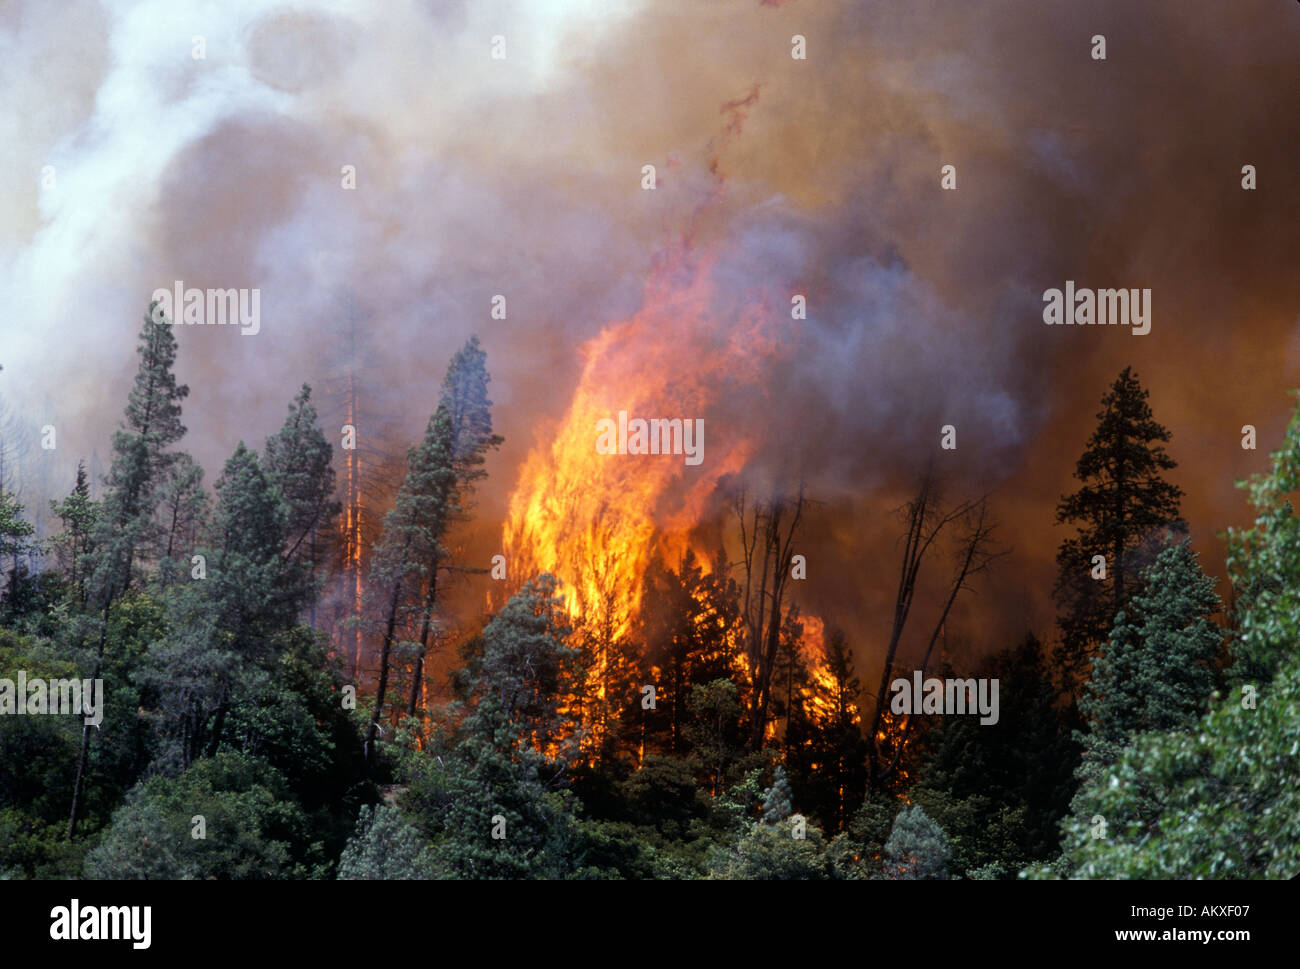 Big flames burn through conifer forest - Stock Image